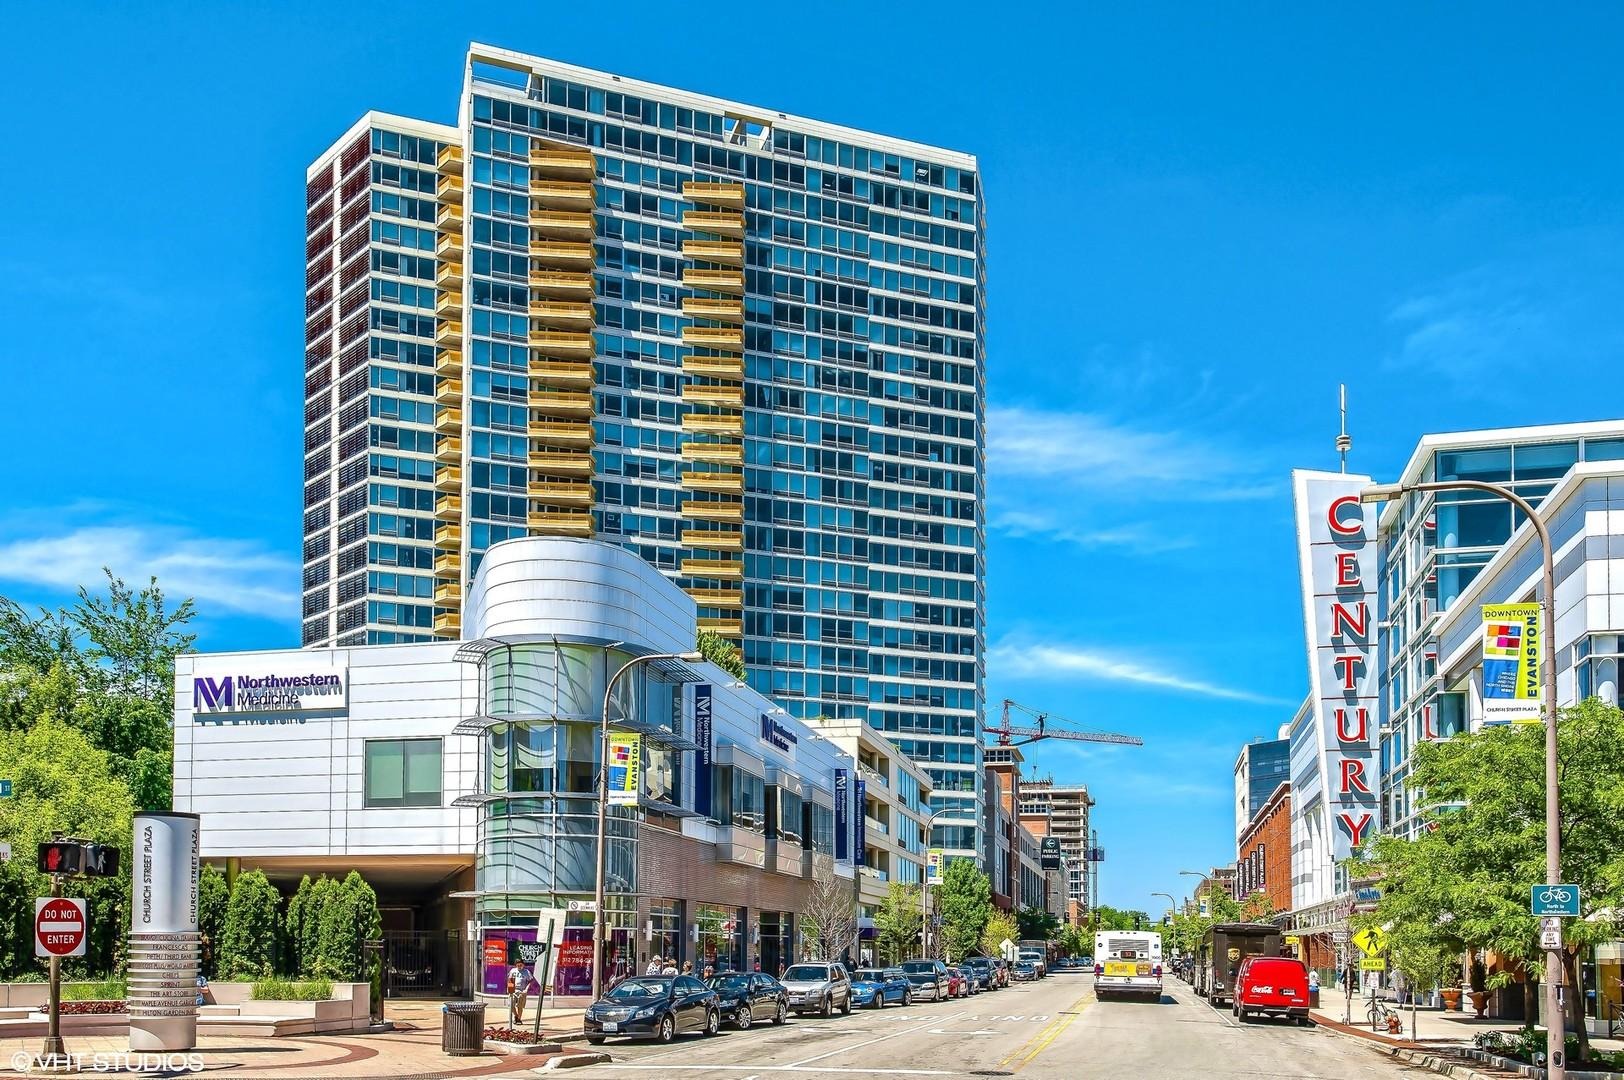 1720 Maple Avenue, Evanston, Illinois